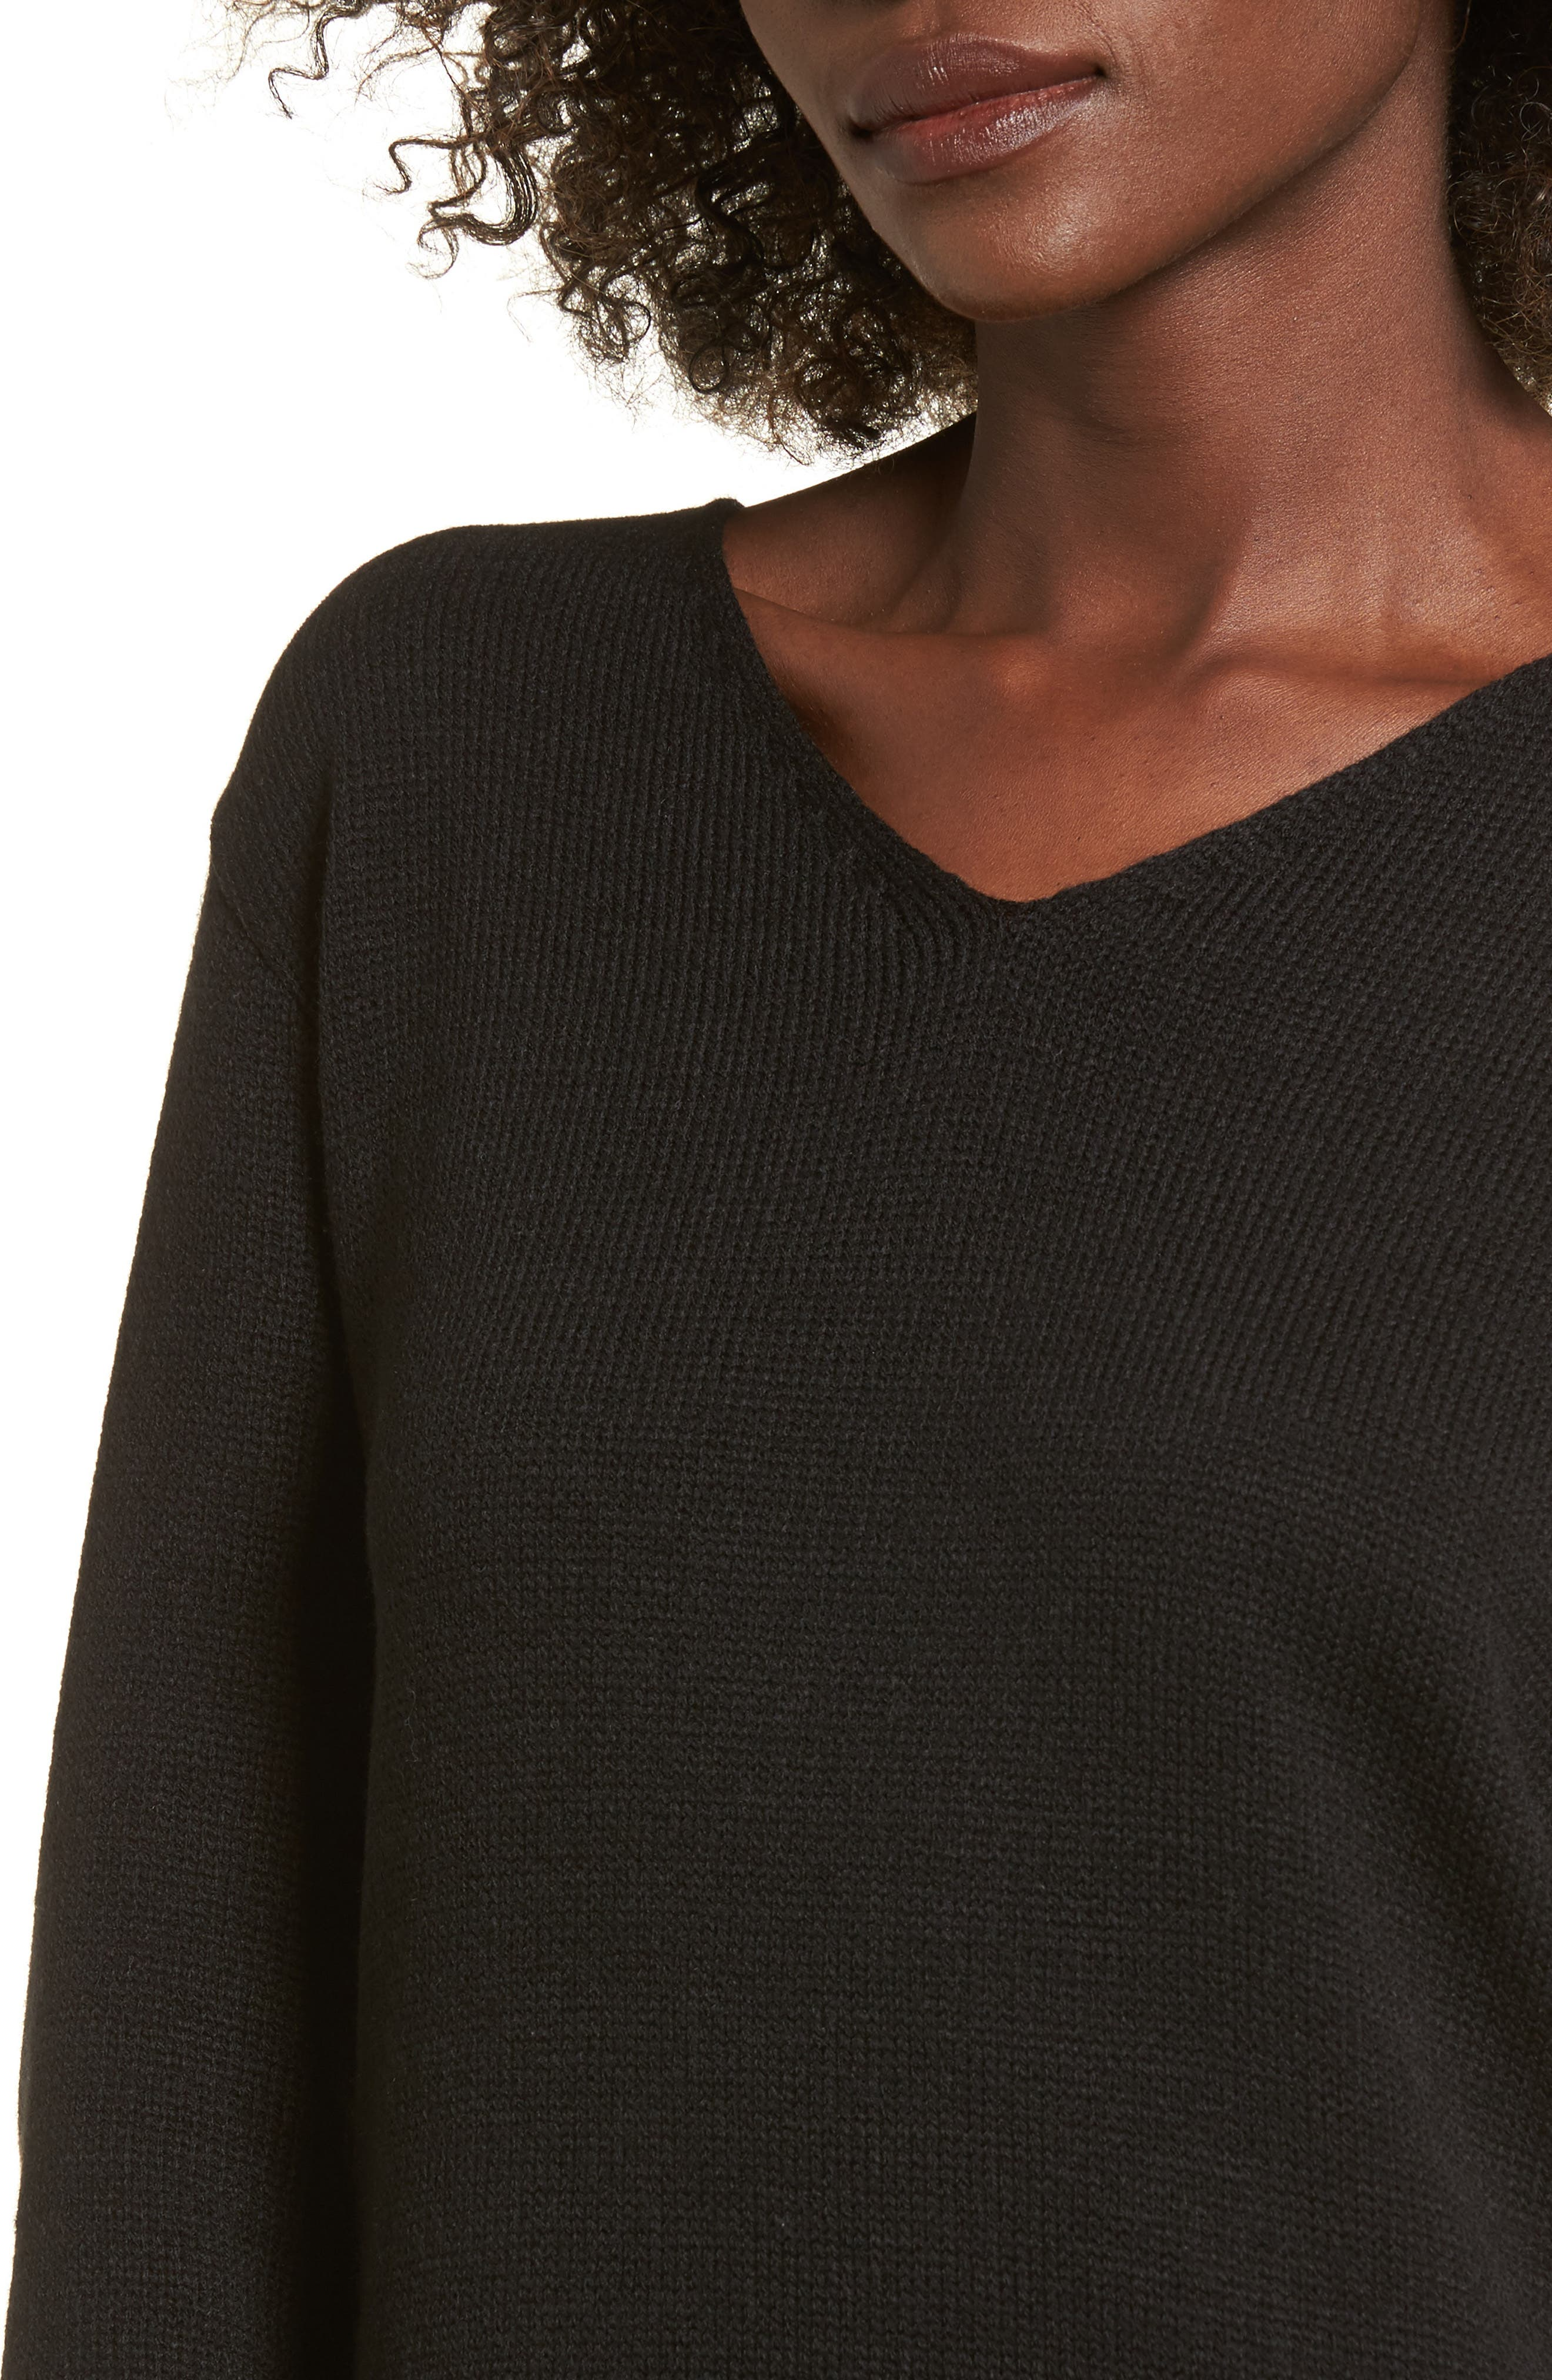 Sweater Dress,                             Alternate thumbnail 4, color,                             Black